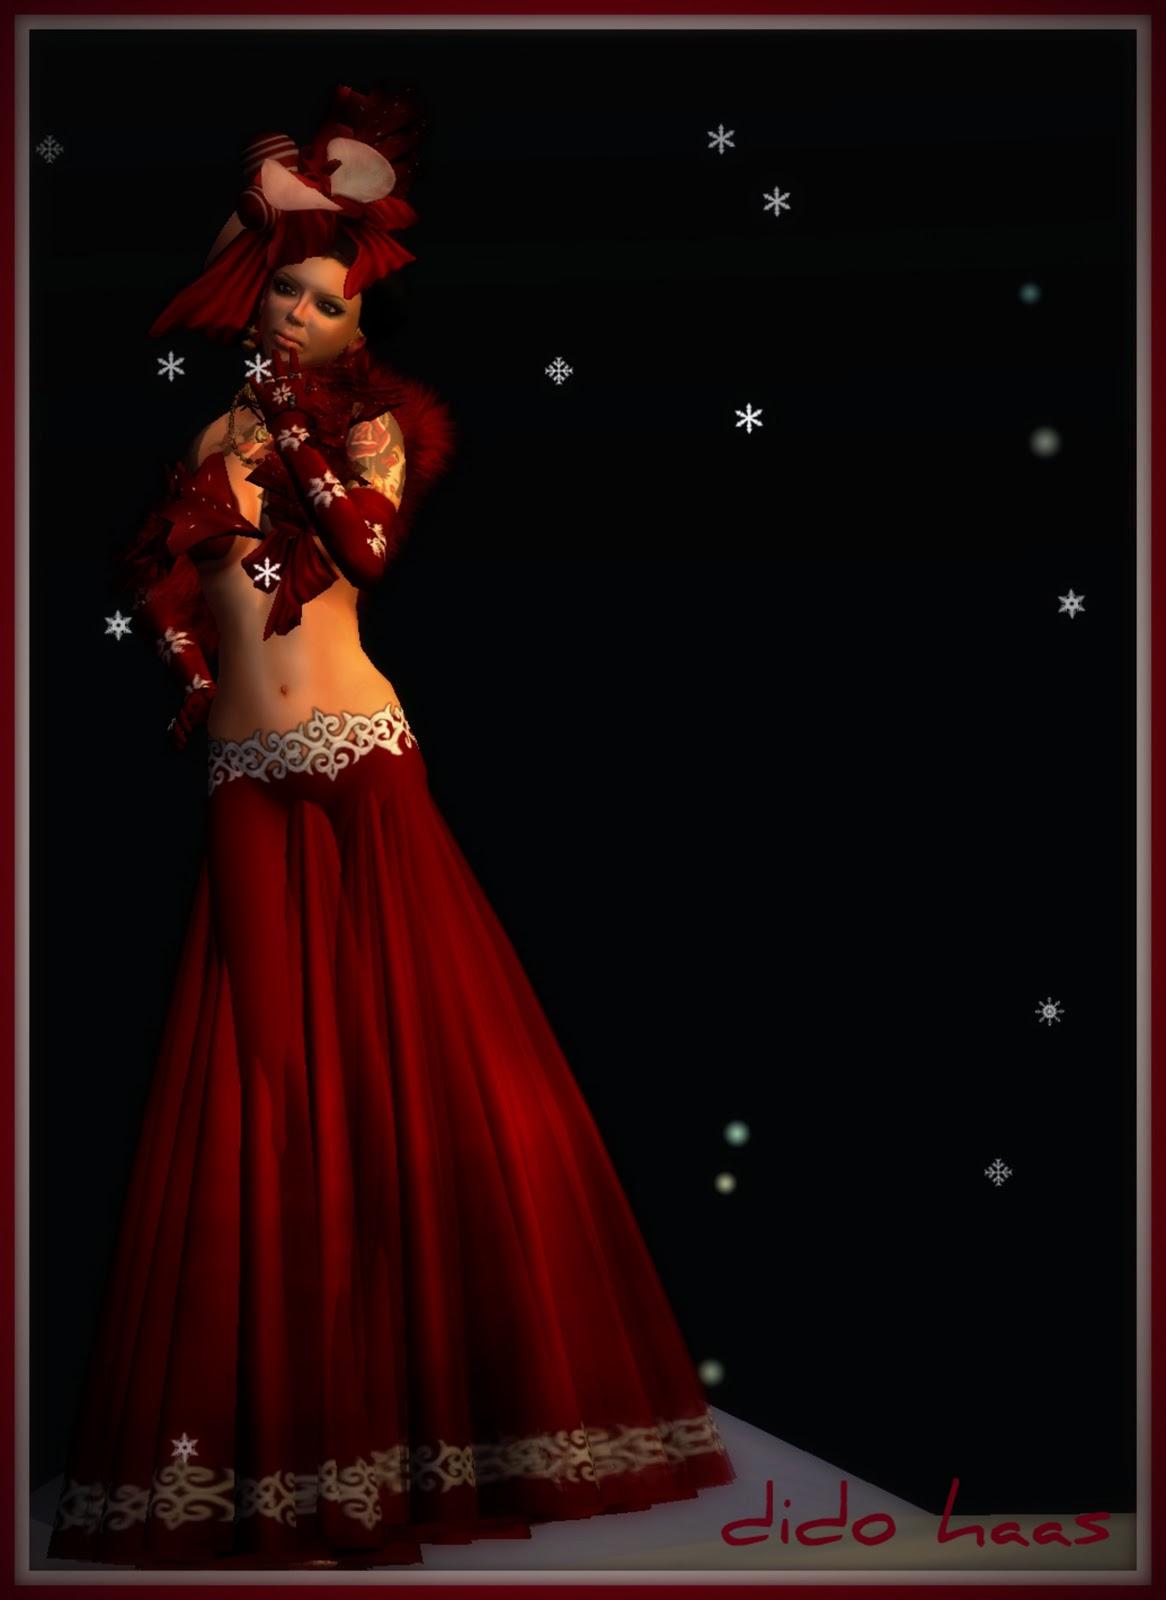 http://3.bp.blogspot.com/-6pRY1s1hmqA/TvJdfeXsjvI/AAAAAAAAF5s/AEQbFk37V9c/s1600/LeeZu+Anastasia.jpg